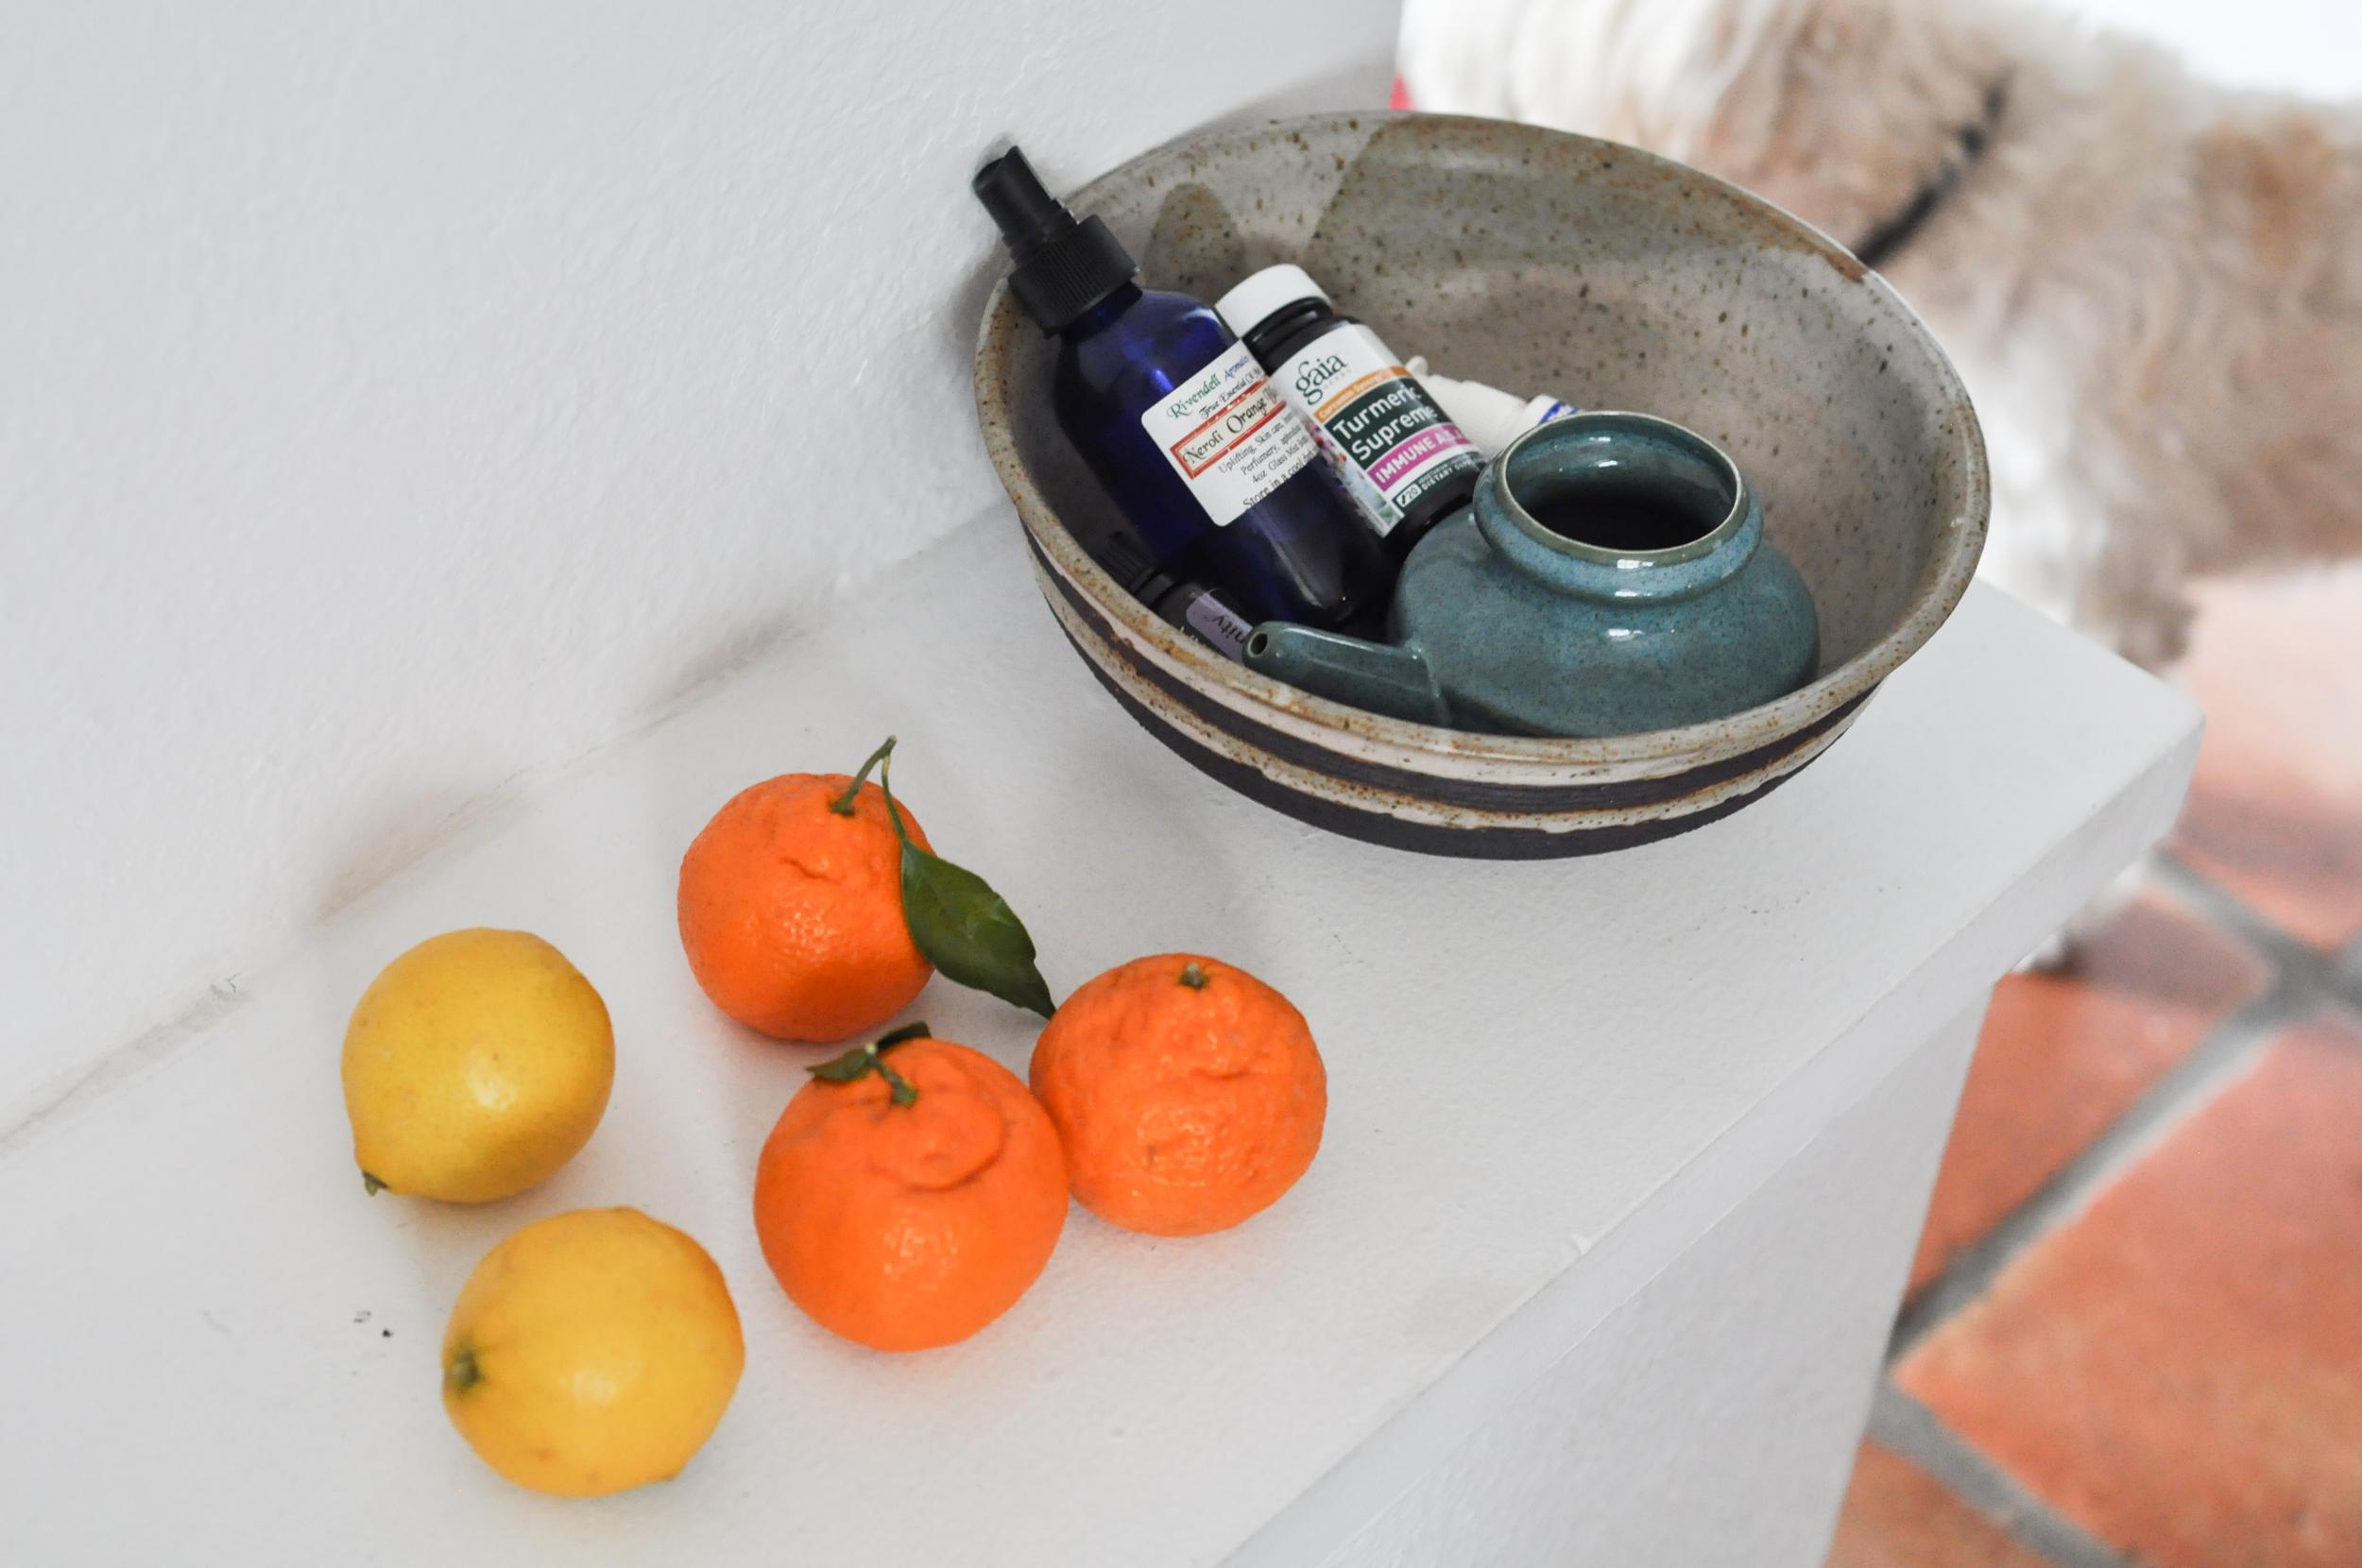 free-and-native-citrus-sick